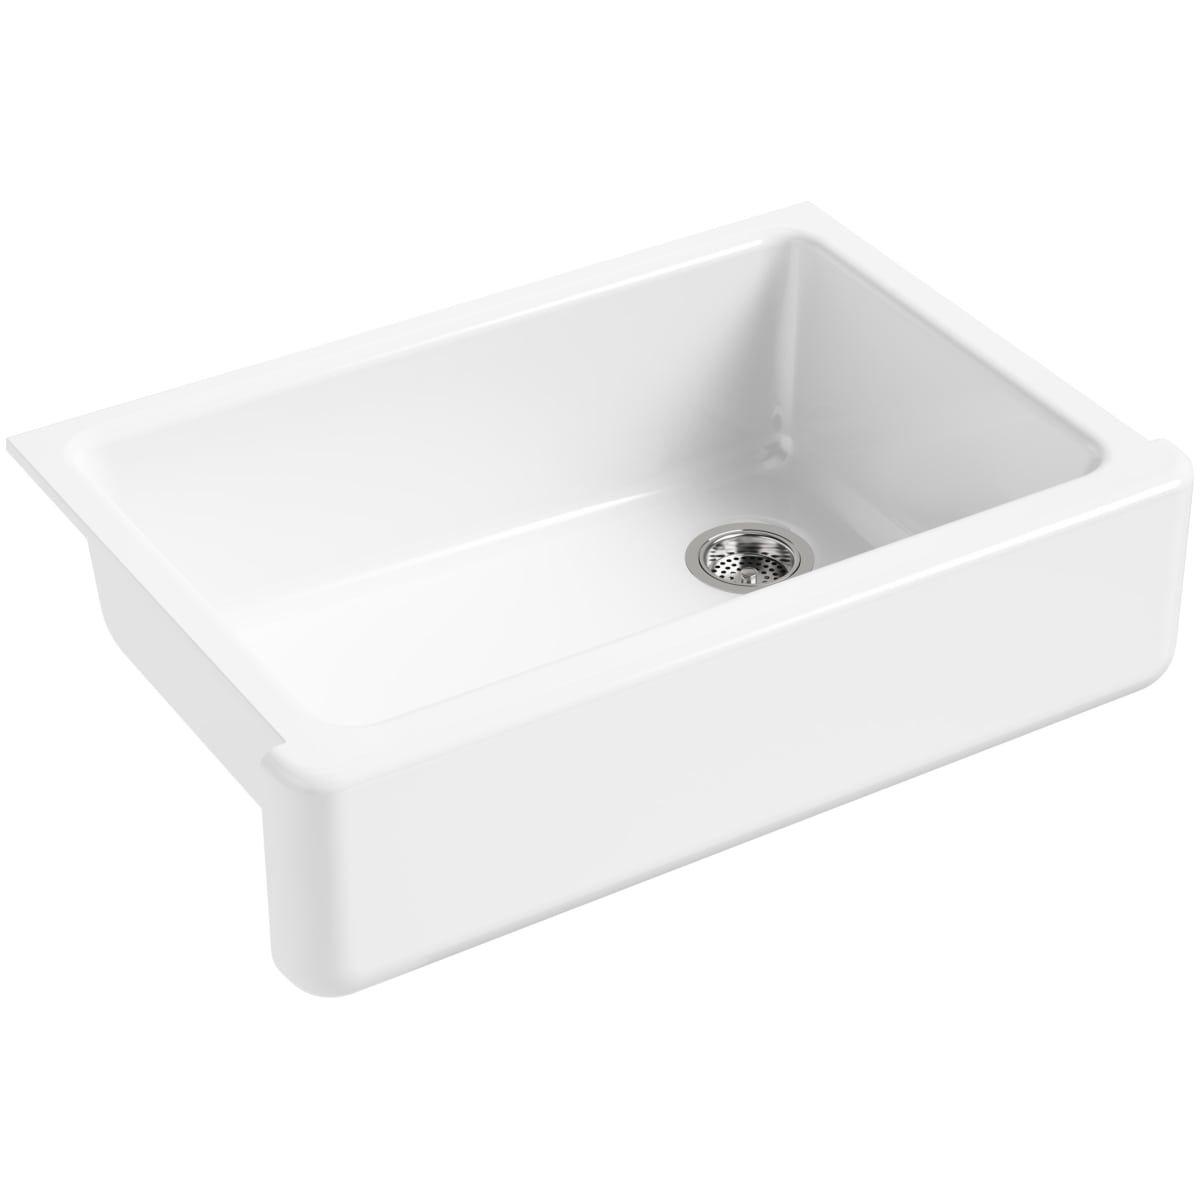 Kohler K 5827 Cast Iron Kitchen Sinks Single Bowl Kitchen Sink